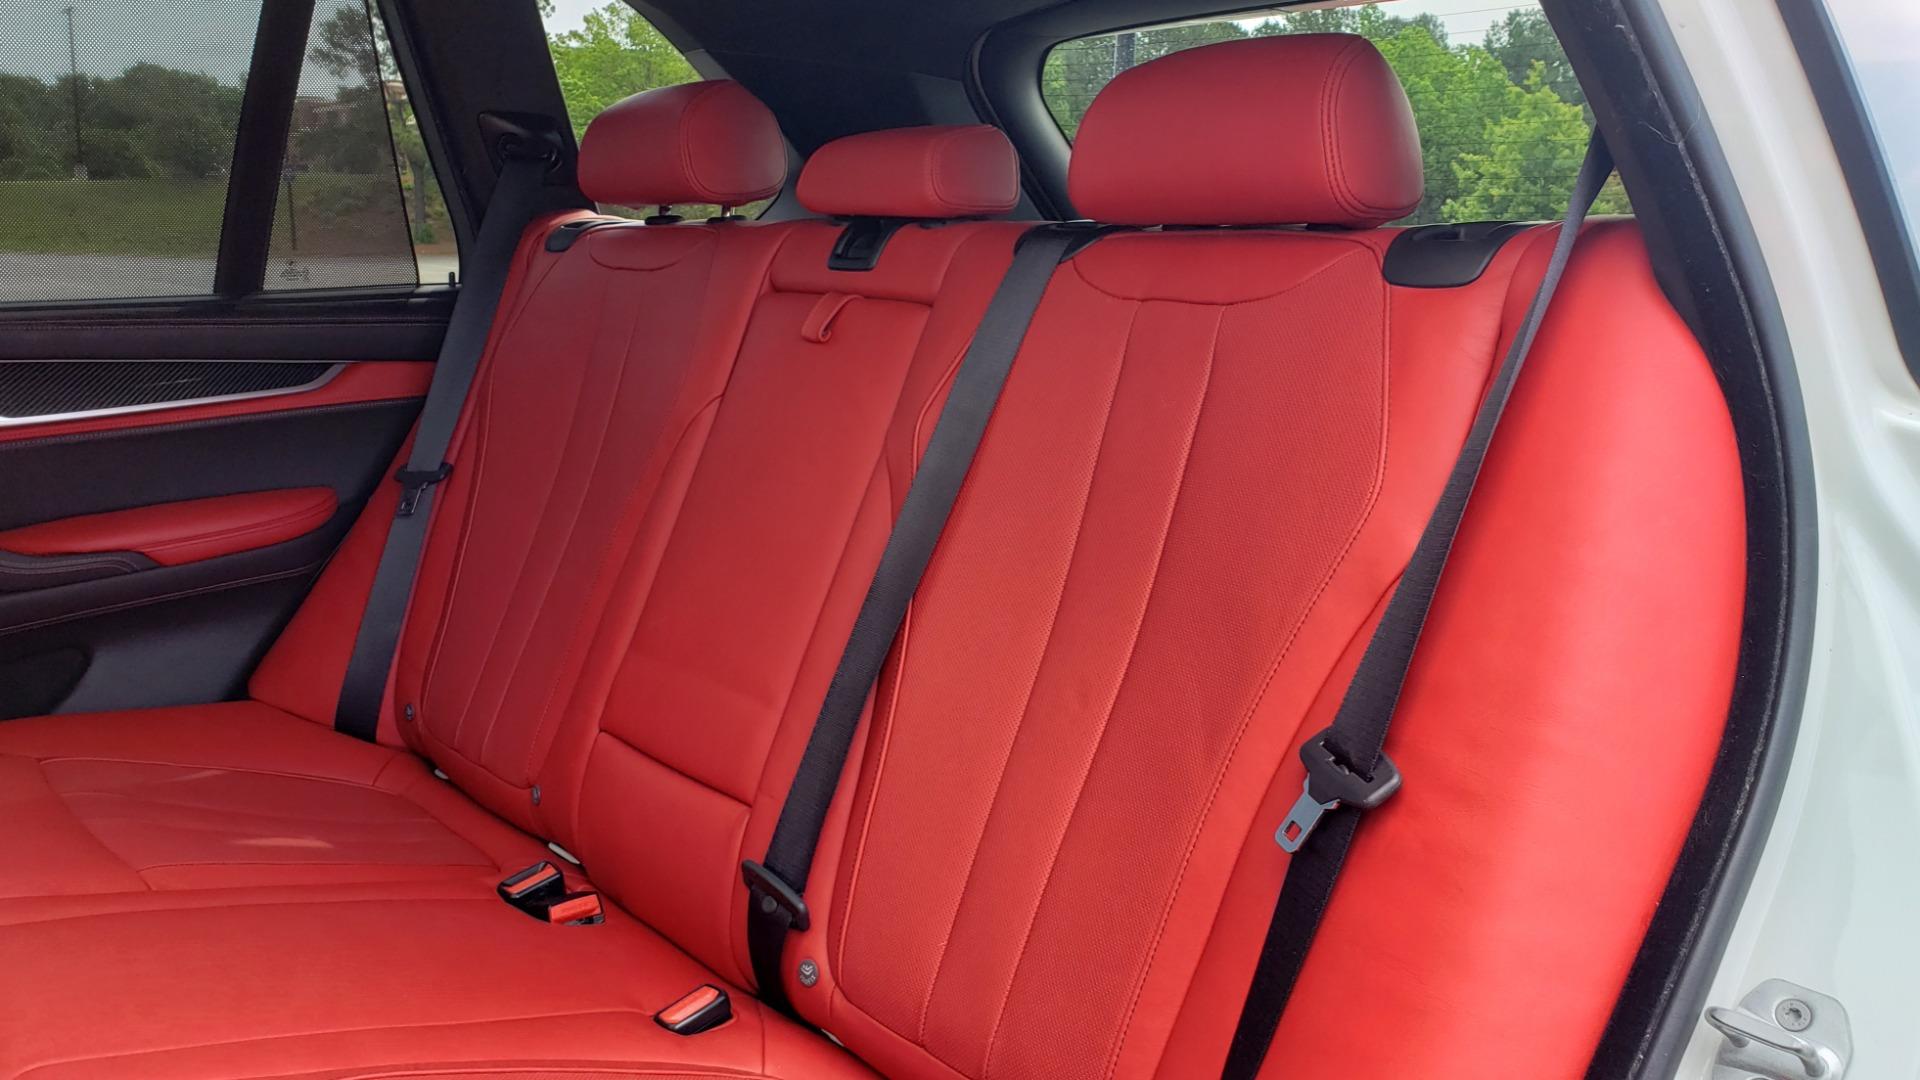 Used 2017 BMW X5 M EXECUTIVE PKG / NAV / DRVR ASST / BSM / HUD / HTD STS / WIFI for sale Sold at Formula Imports in Charlotte NC 28227 68